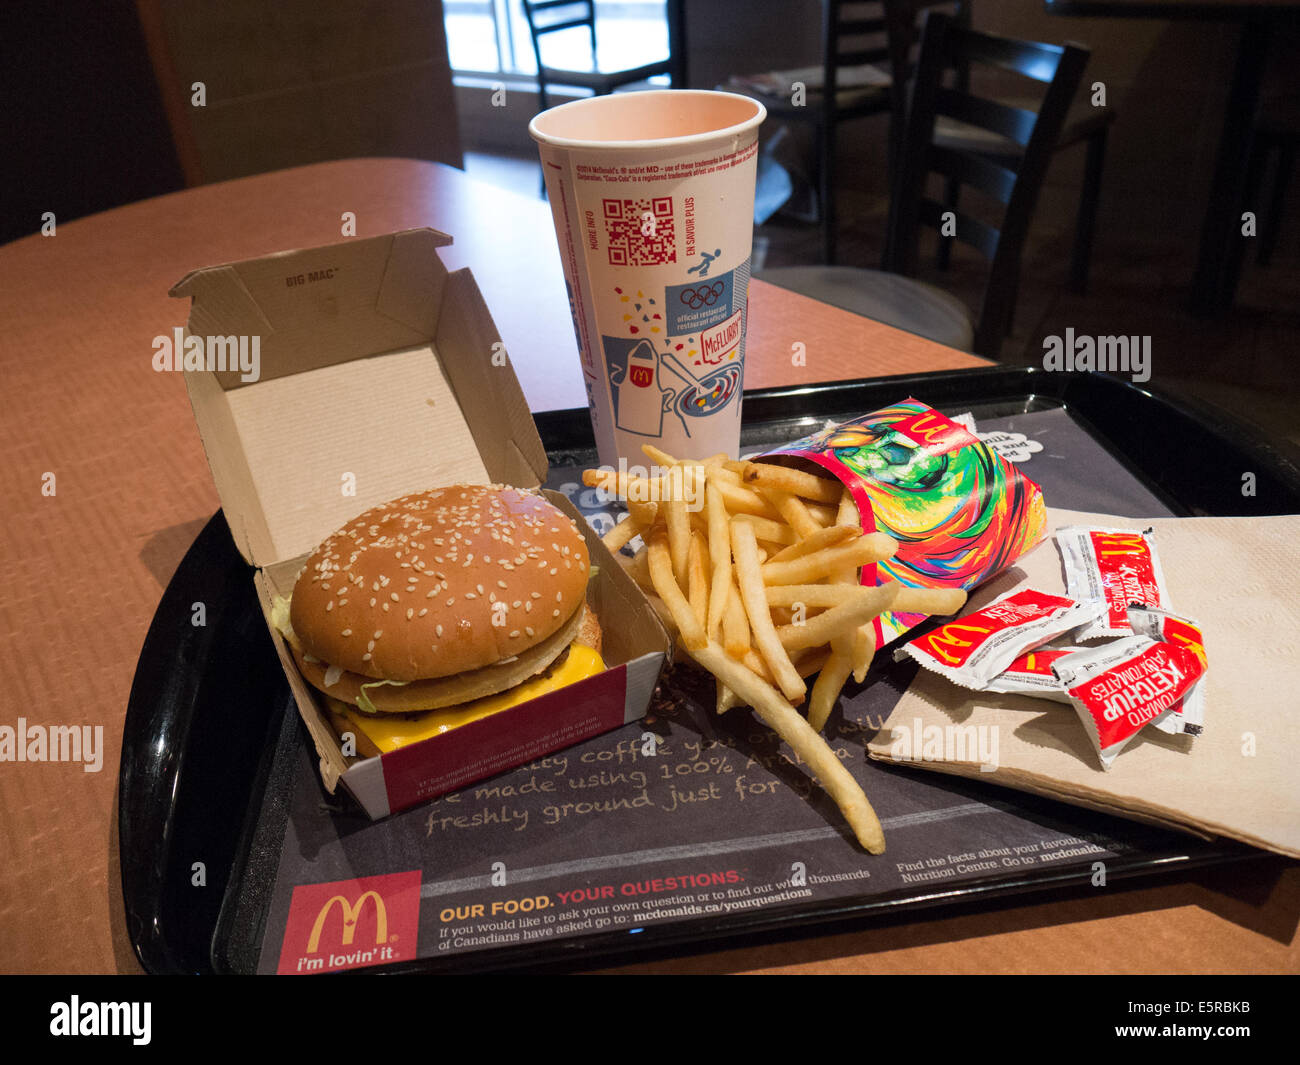 Macdonald fast food big mac meal combo stock photo - Fast good cuisine big mac ...